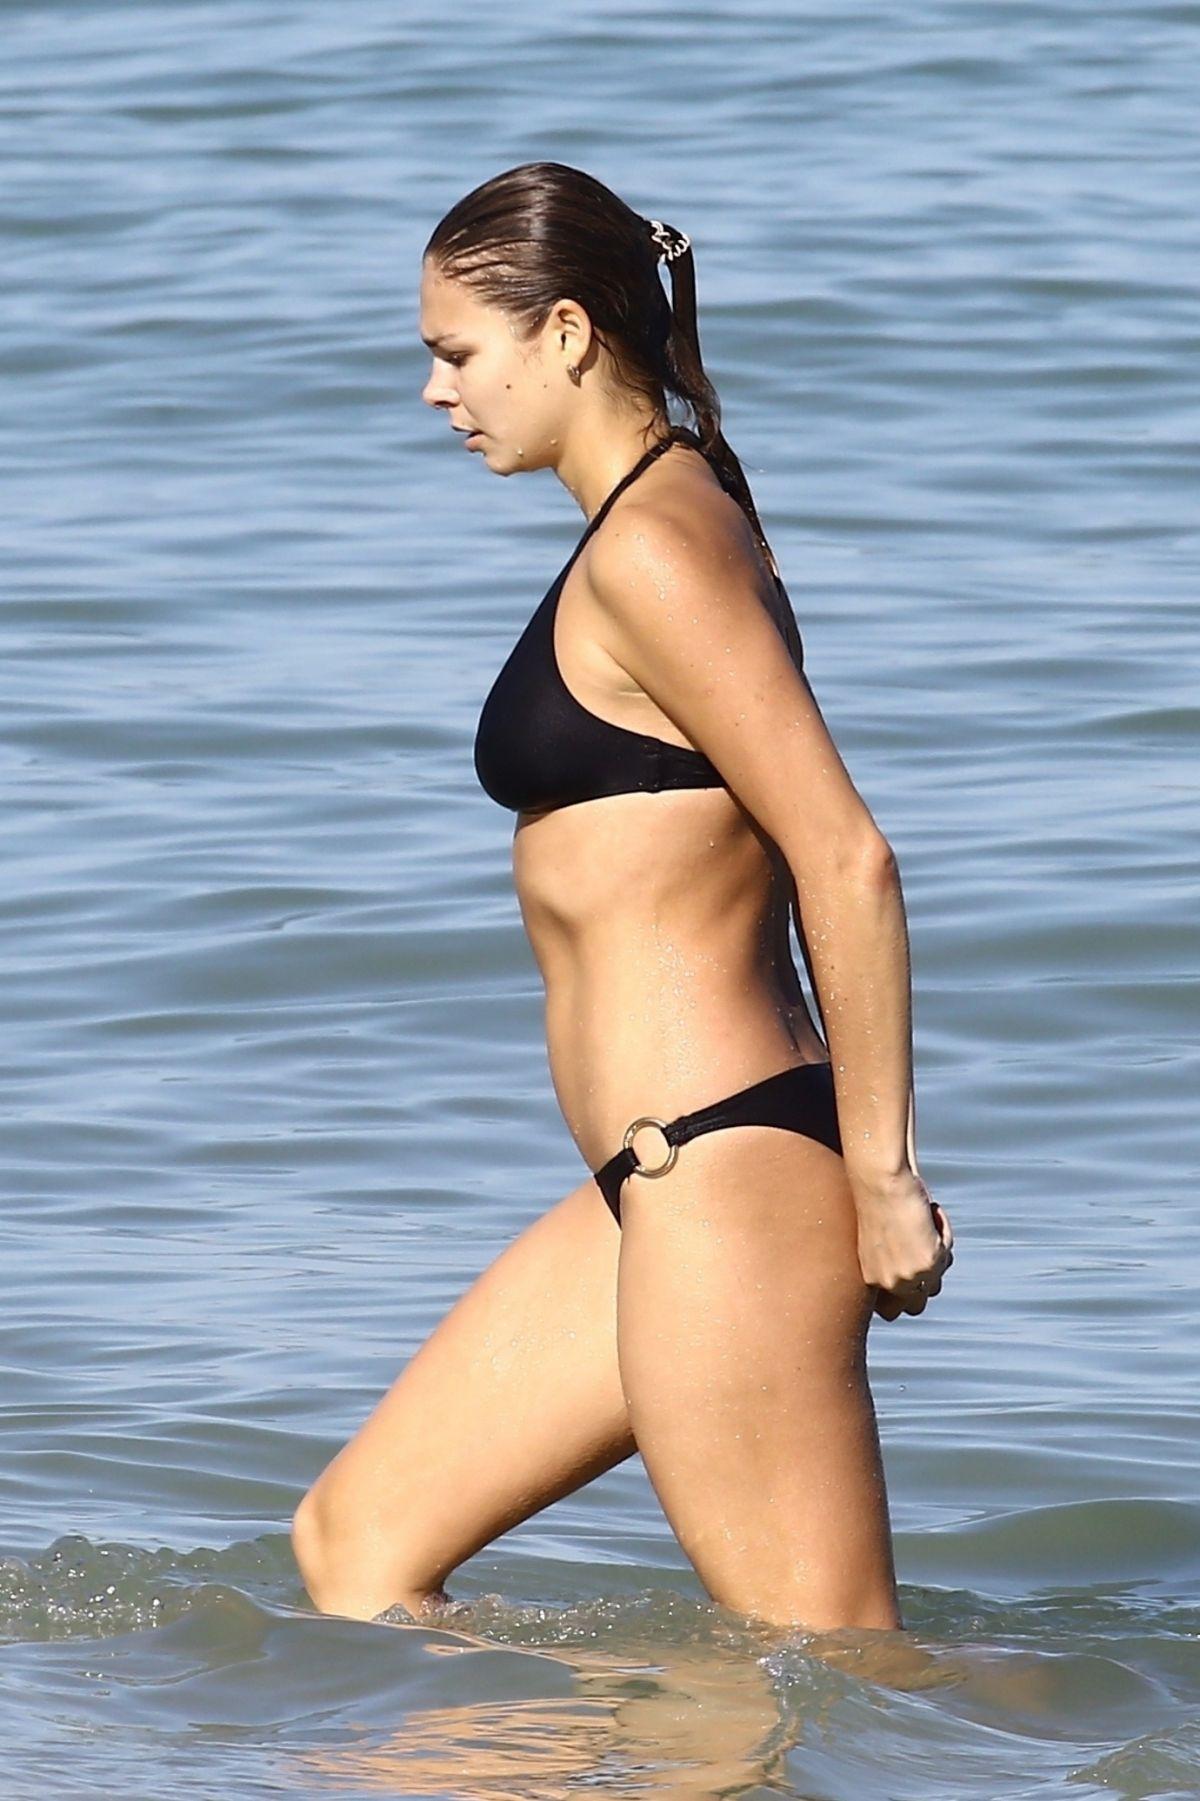 Bikini Alanna Arrington nude (46 photos), Pussy, Hot, Twitter, swimsuit 2006